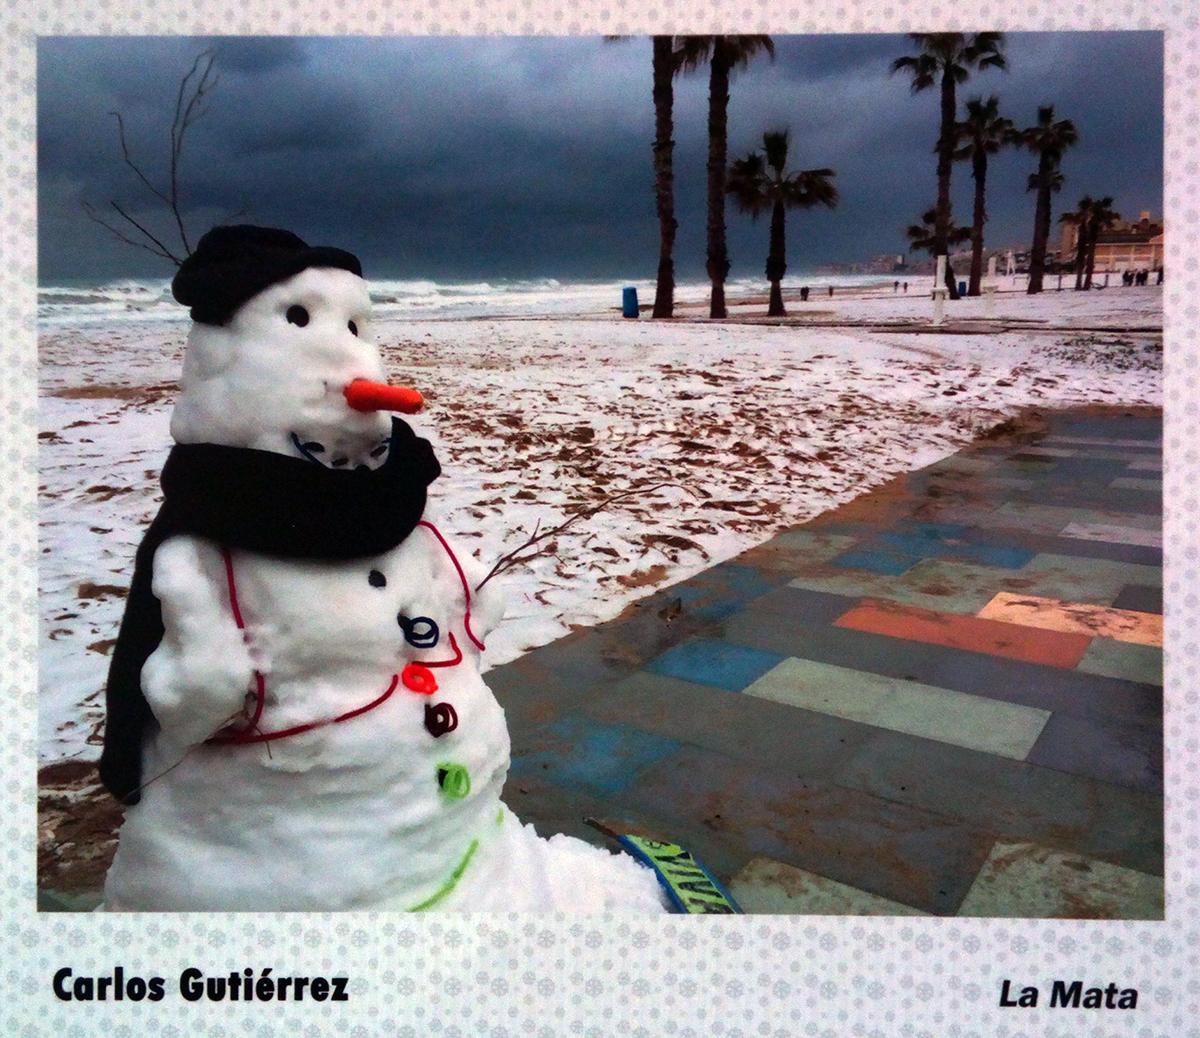 Snow on the Costa Blanca beaches